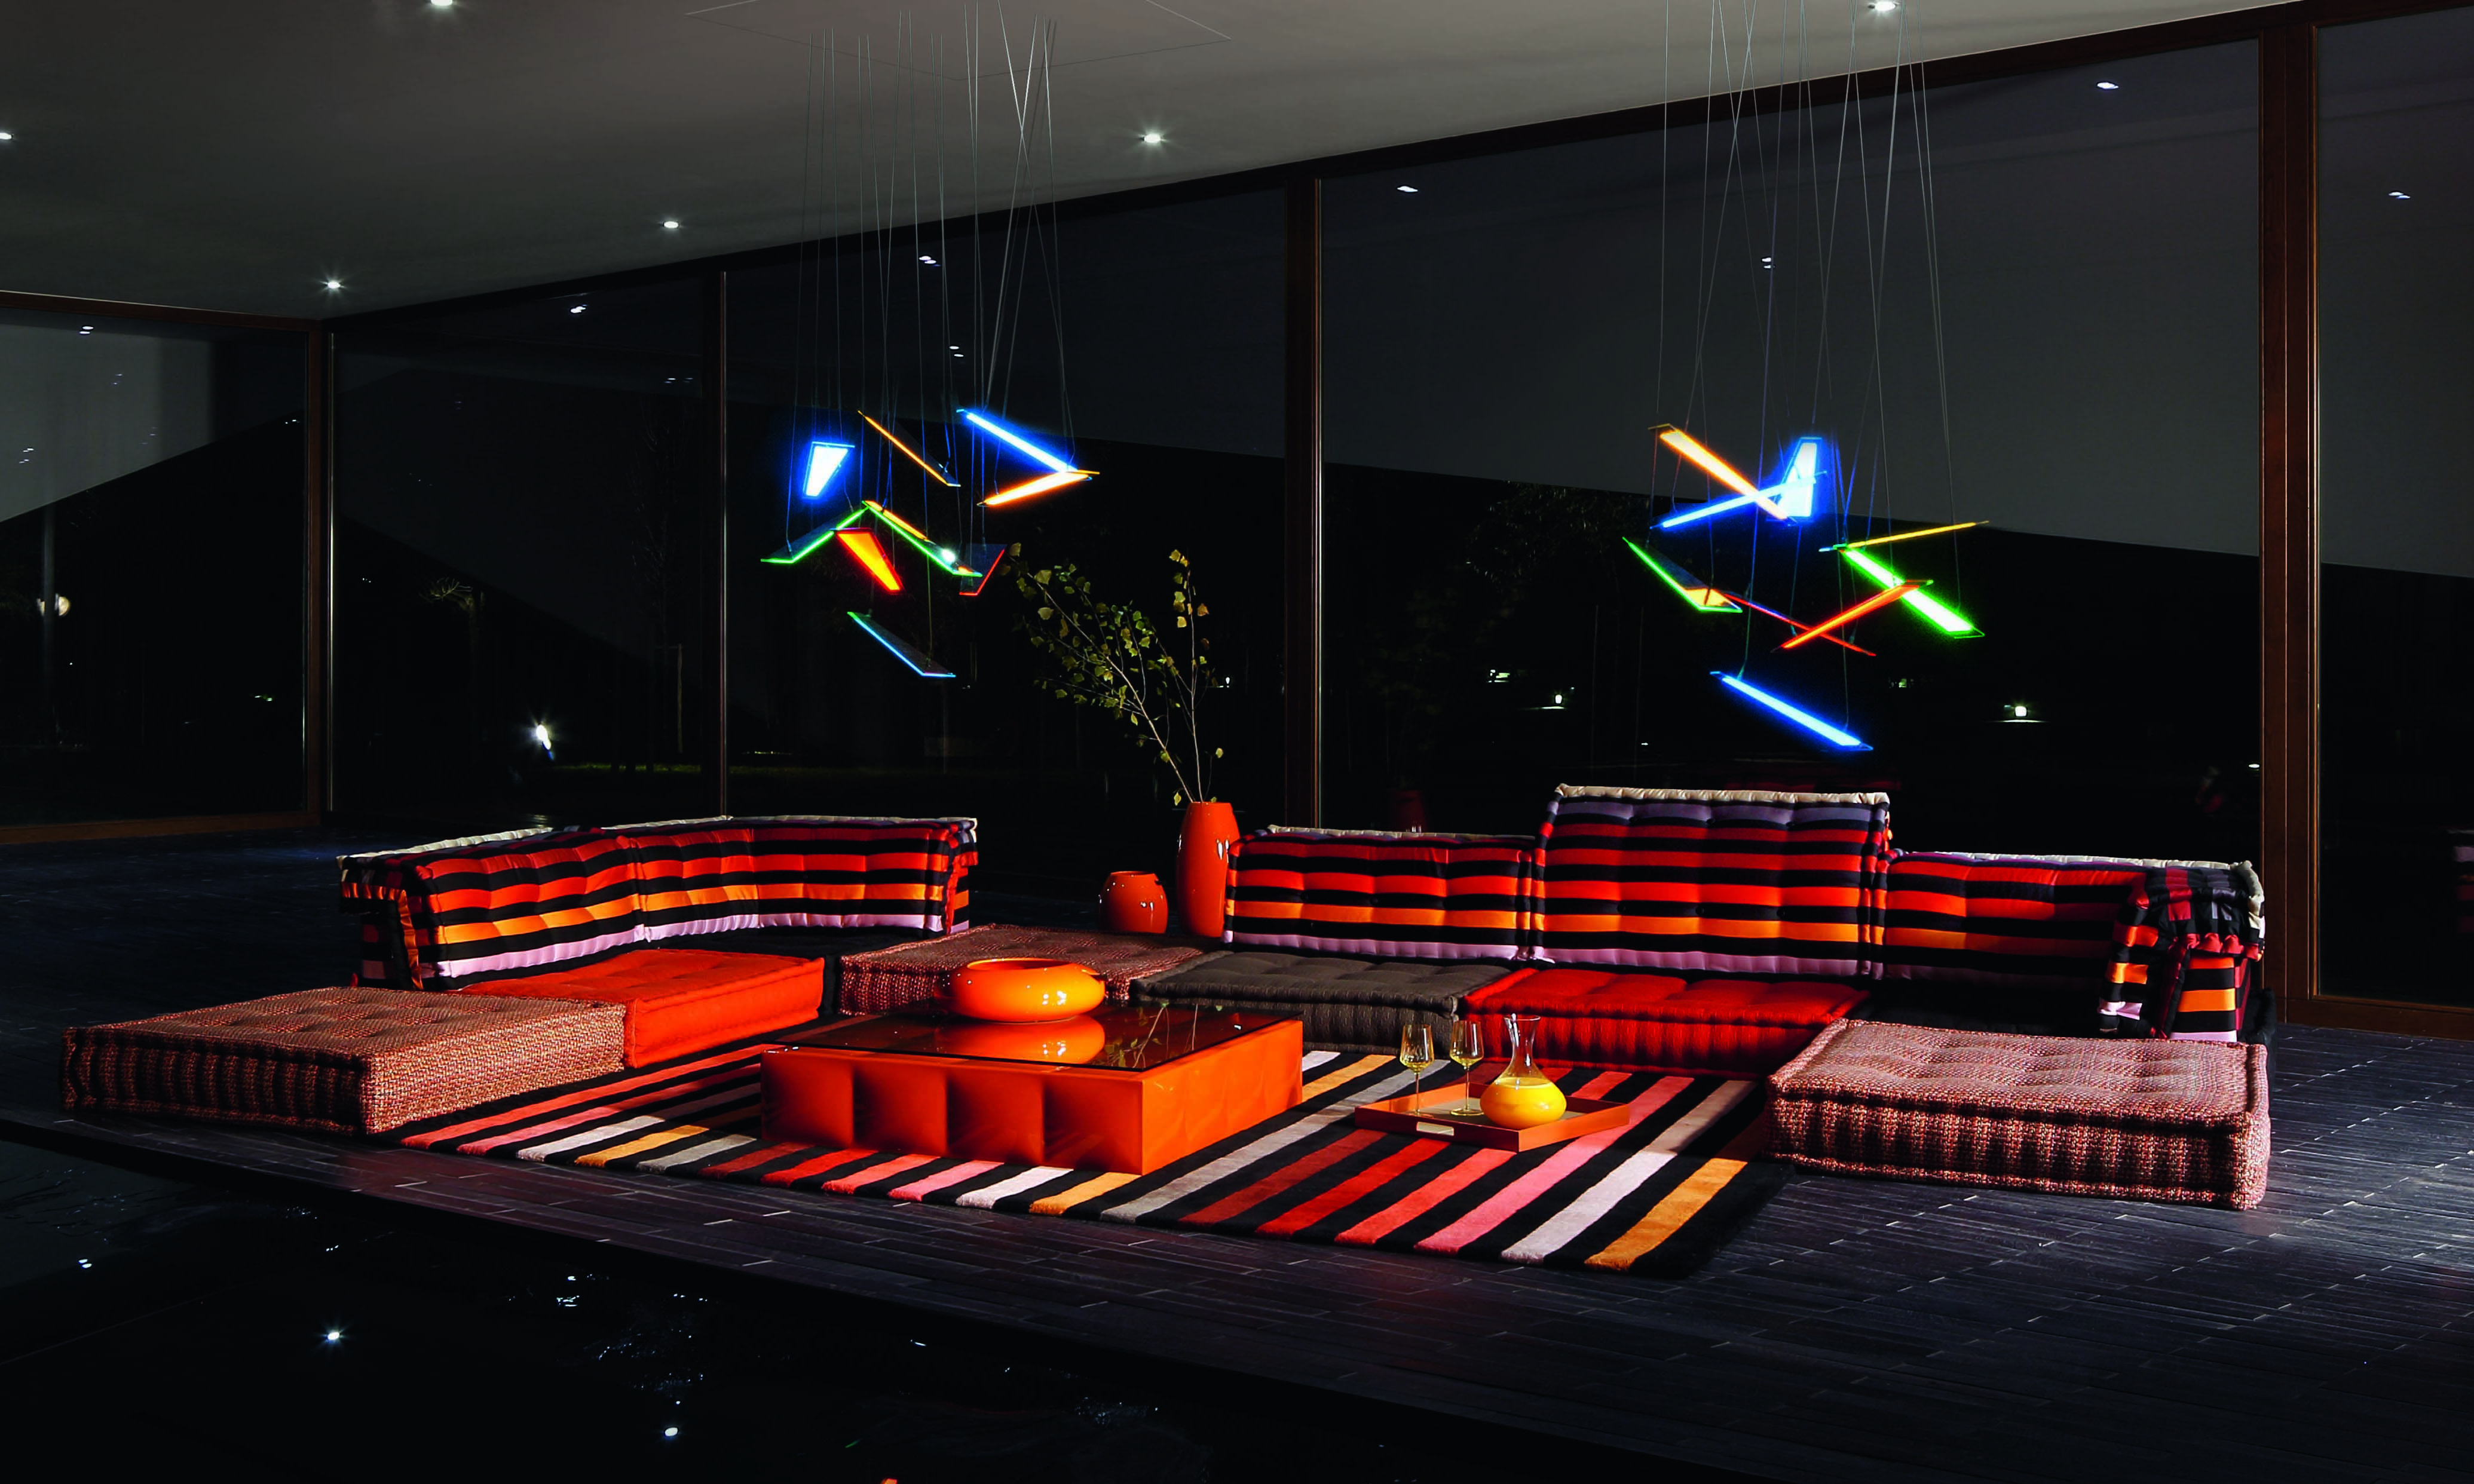 Roche Bobois Mah Jong Modular Sofa Upholstered In Sonia Rykiel